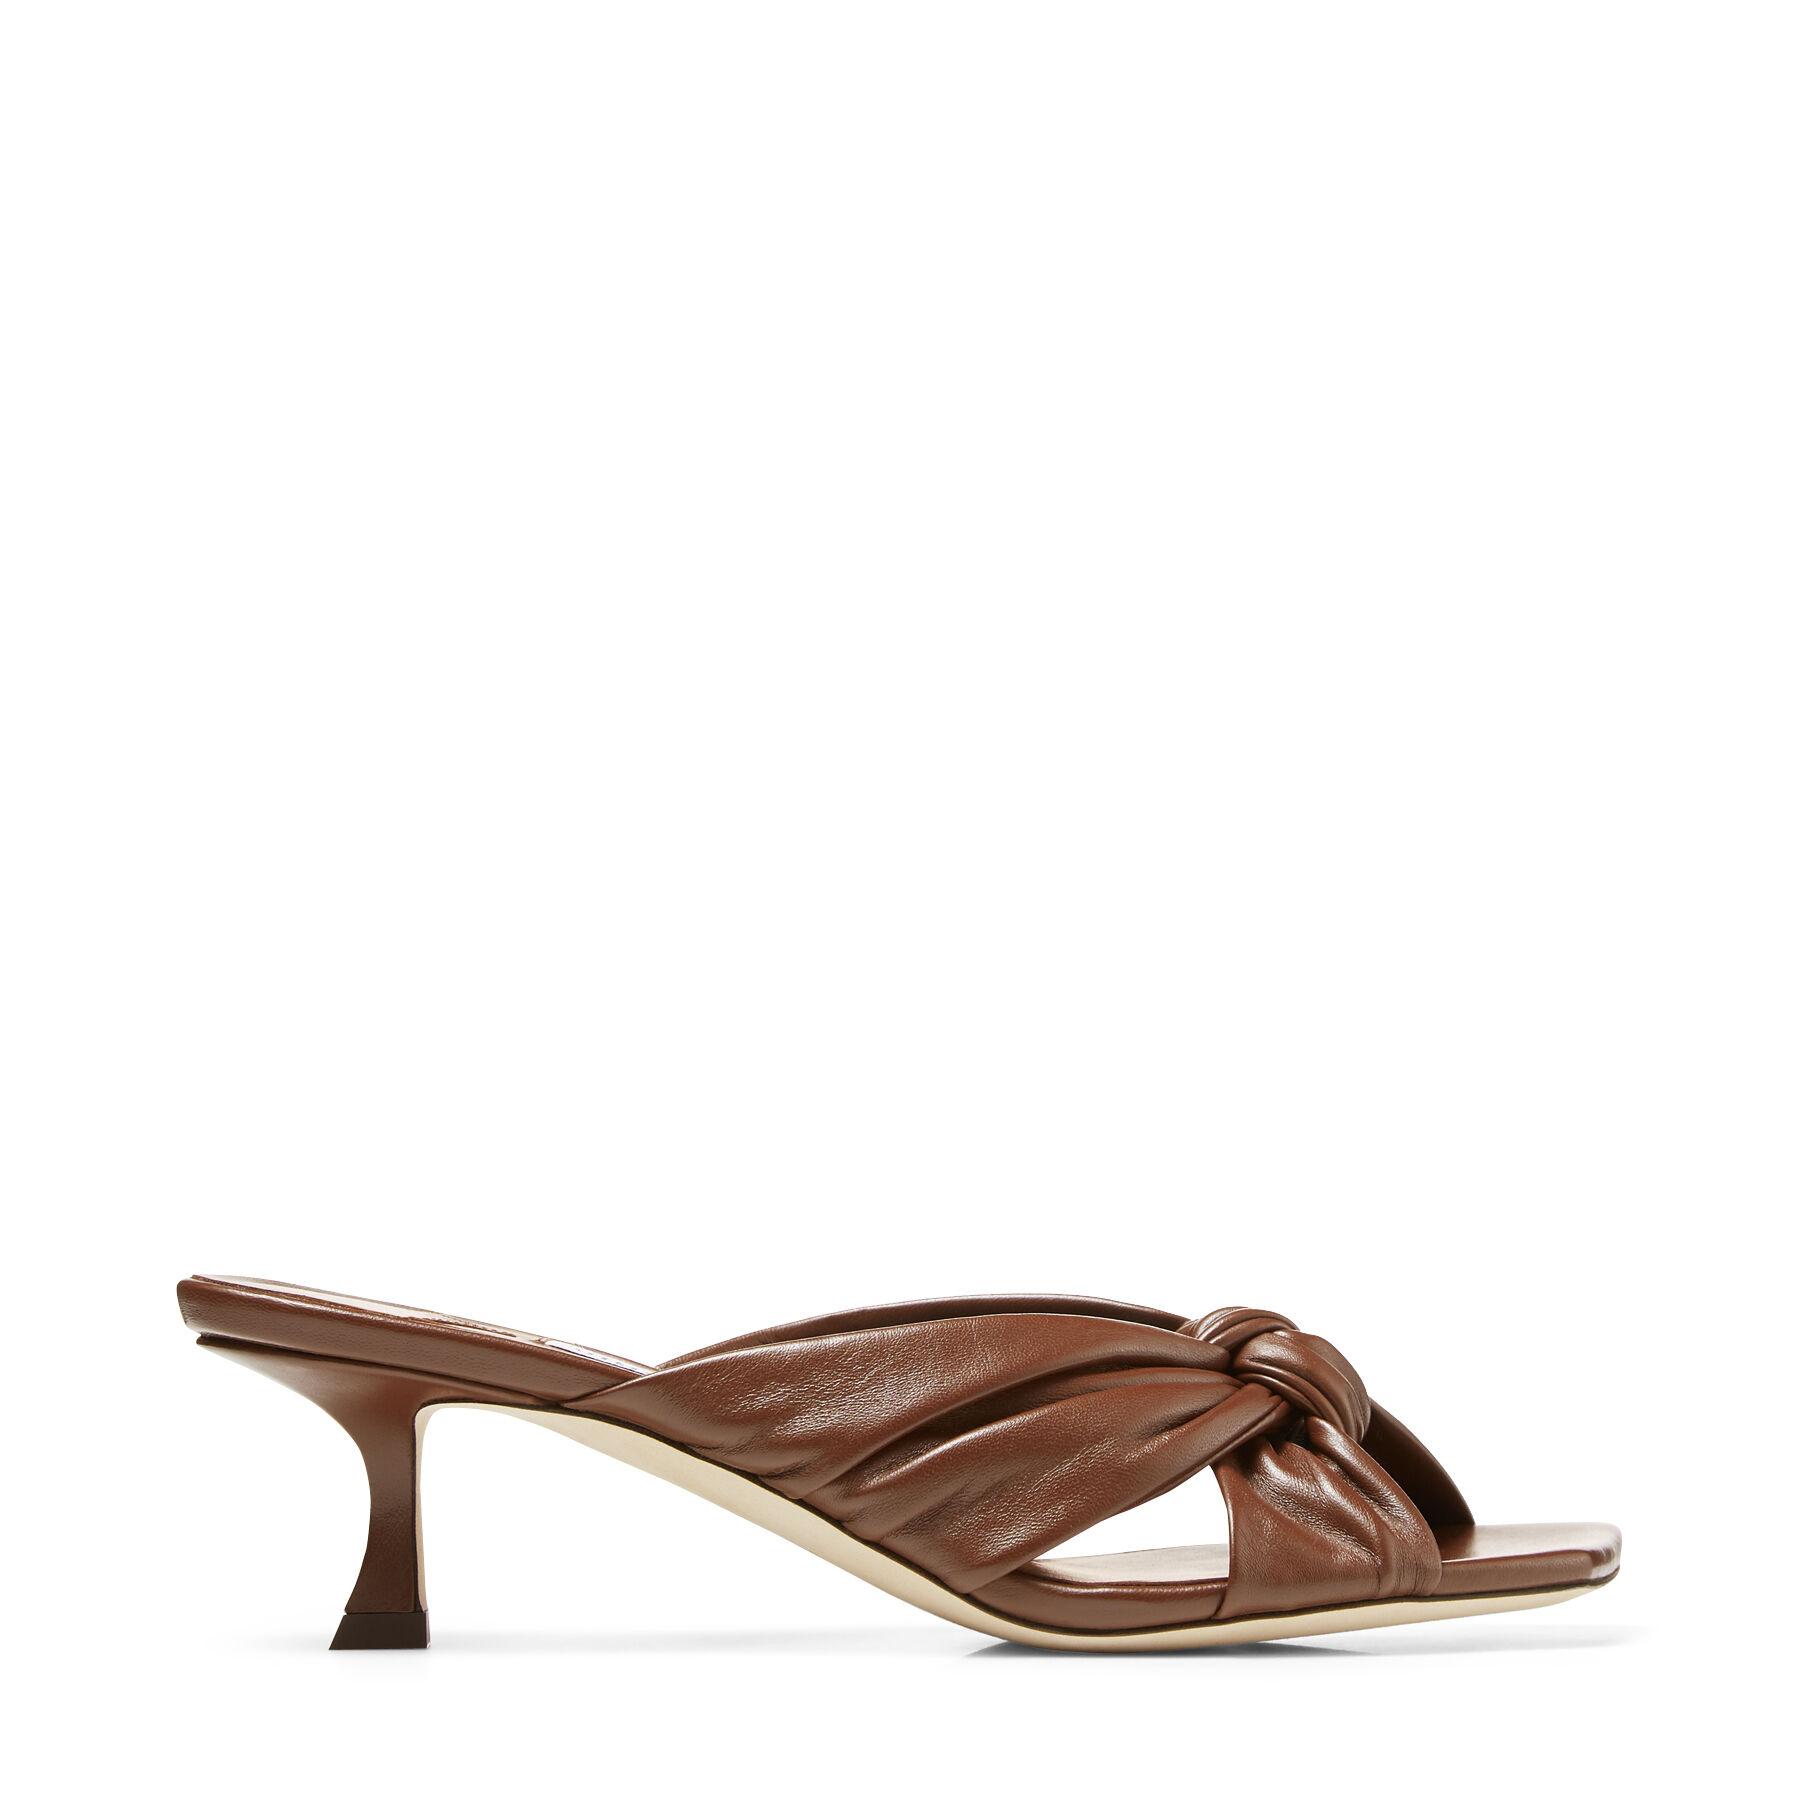 AVENUE 50 - Bronzed Nappa Leather Mules